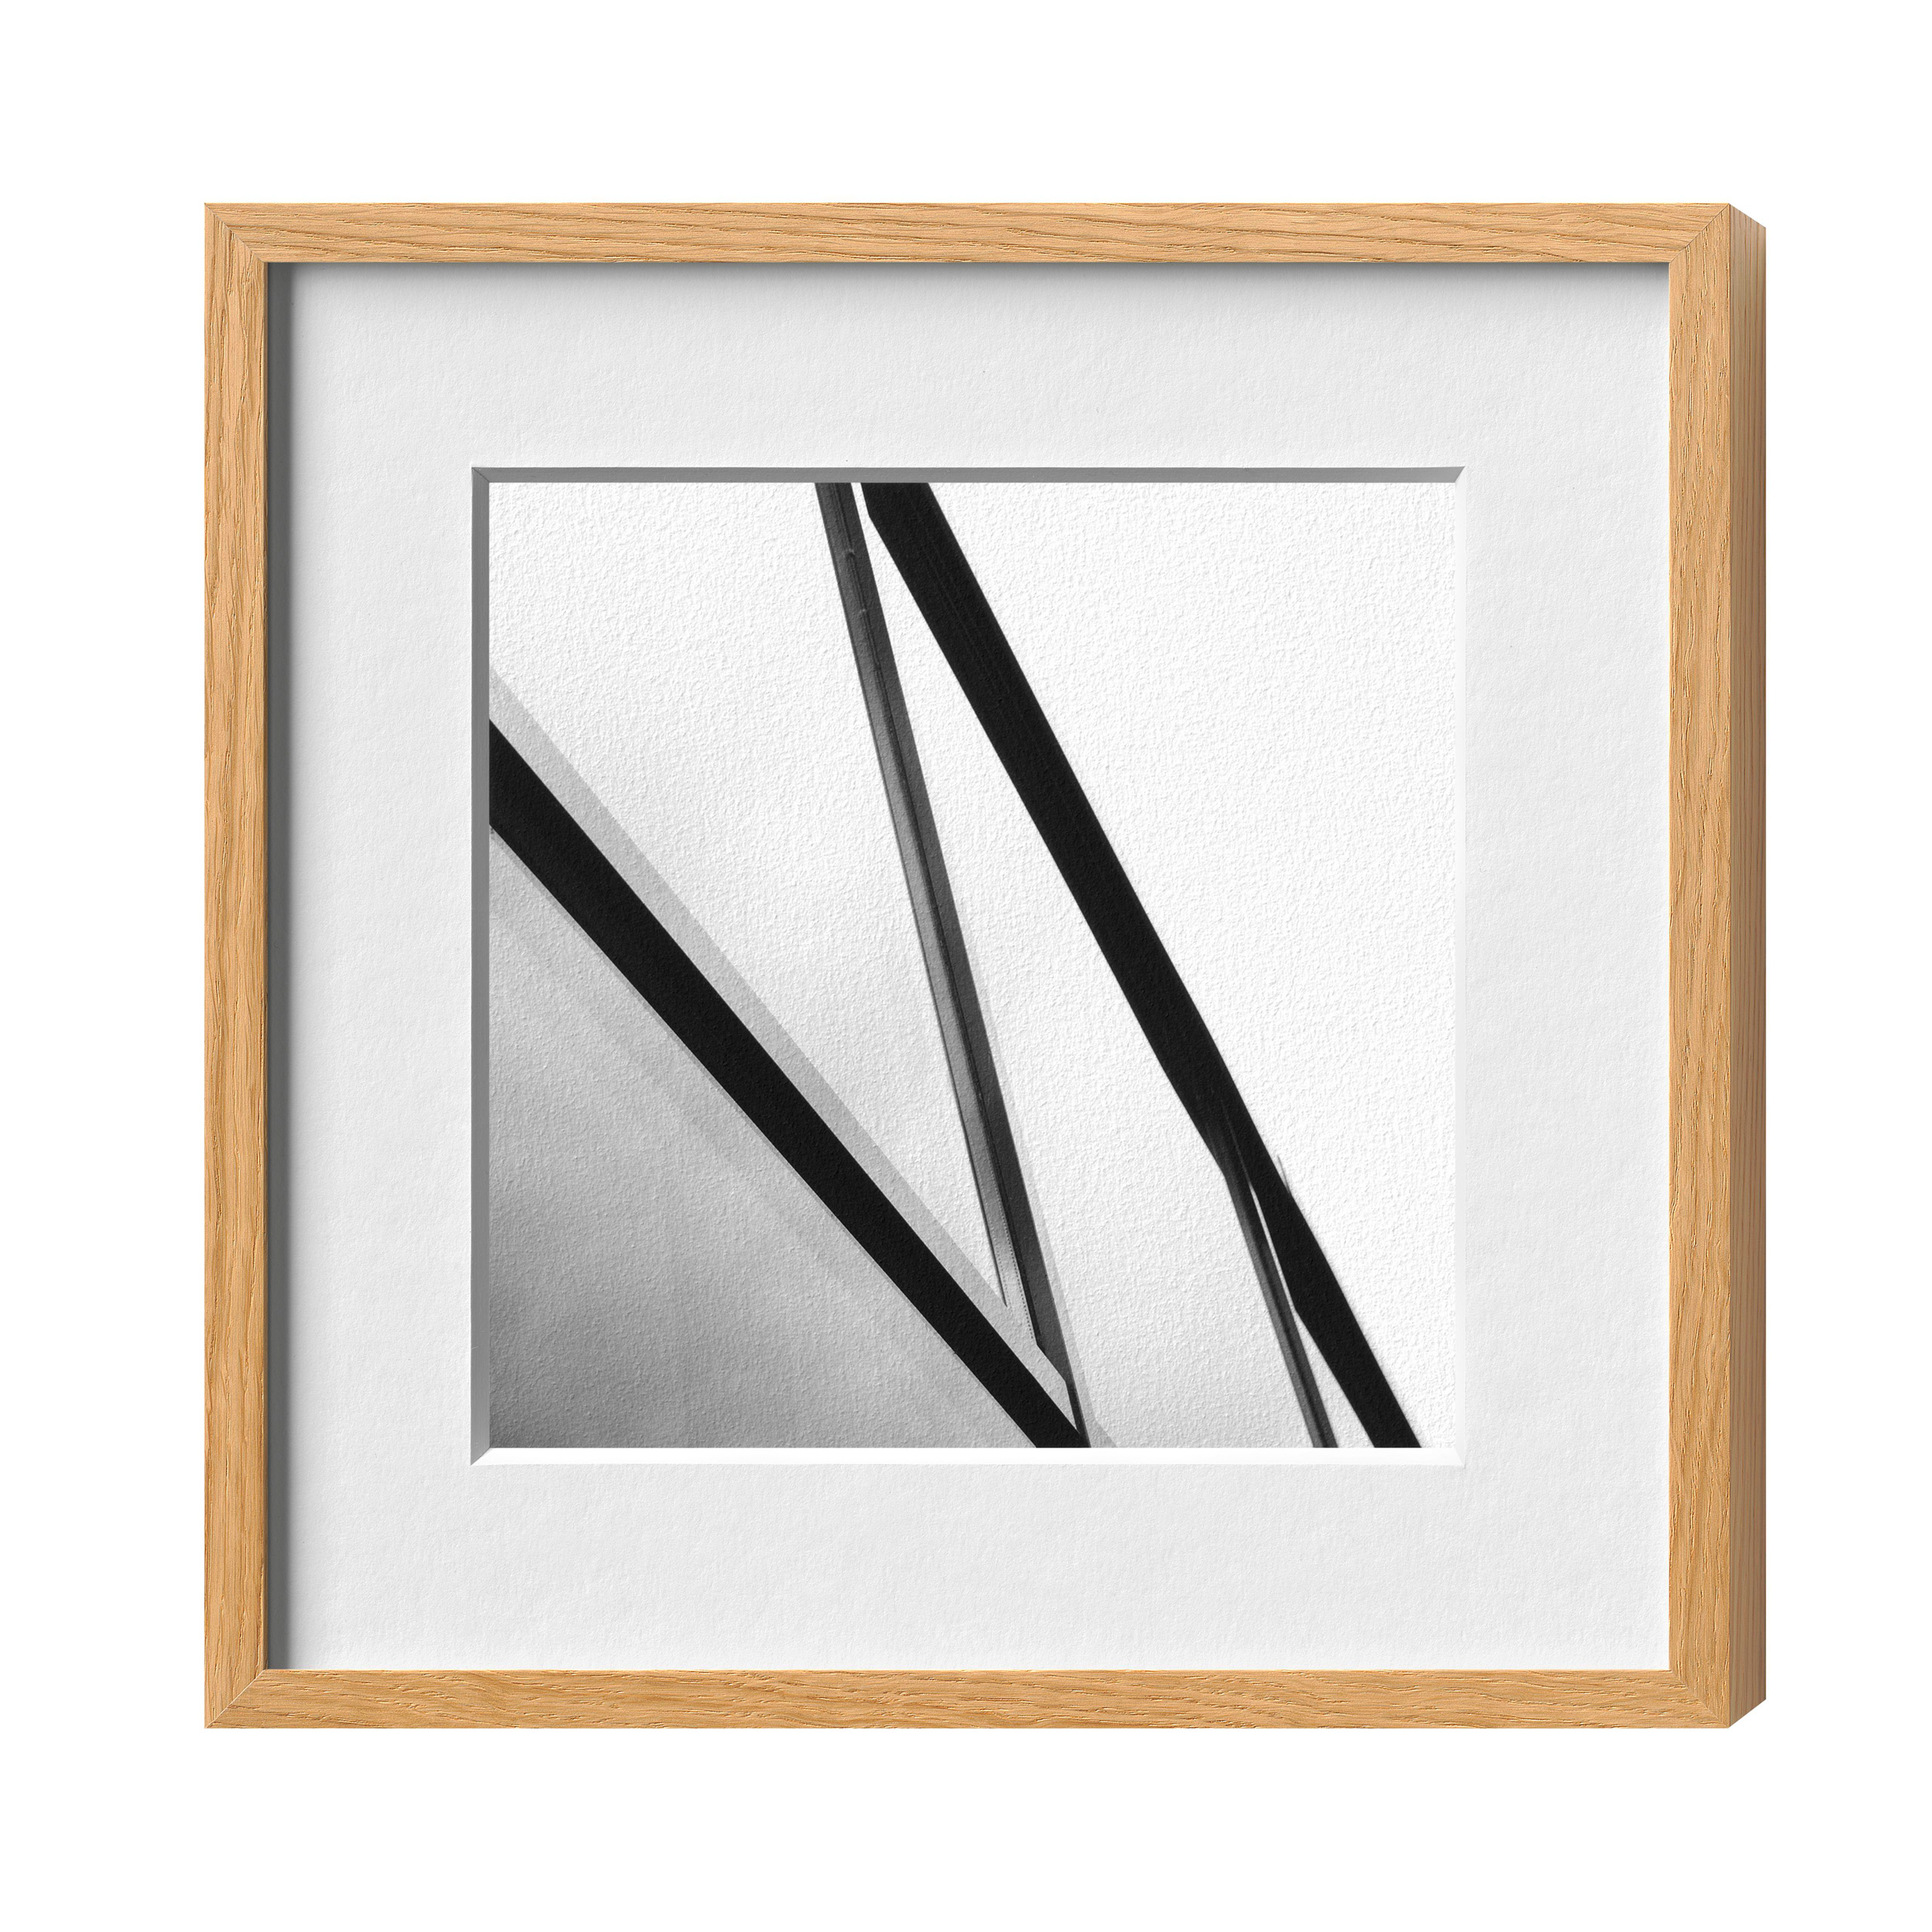 Holz-Bilderrahmen: Bilderrahmen aus Holz von HALBE Rahmen